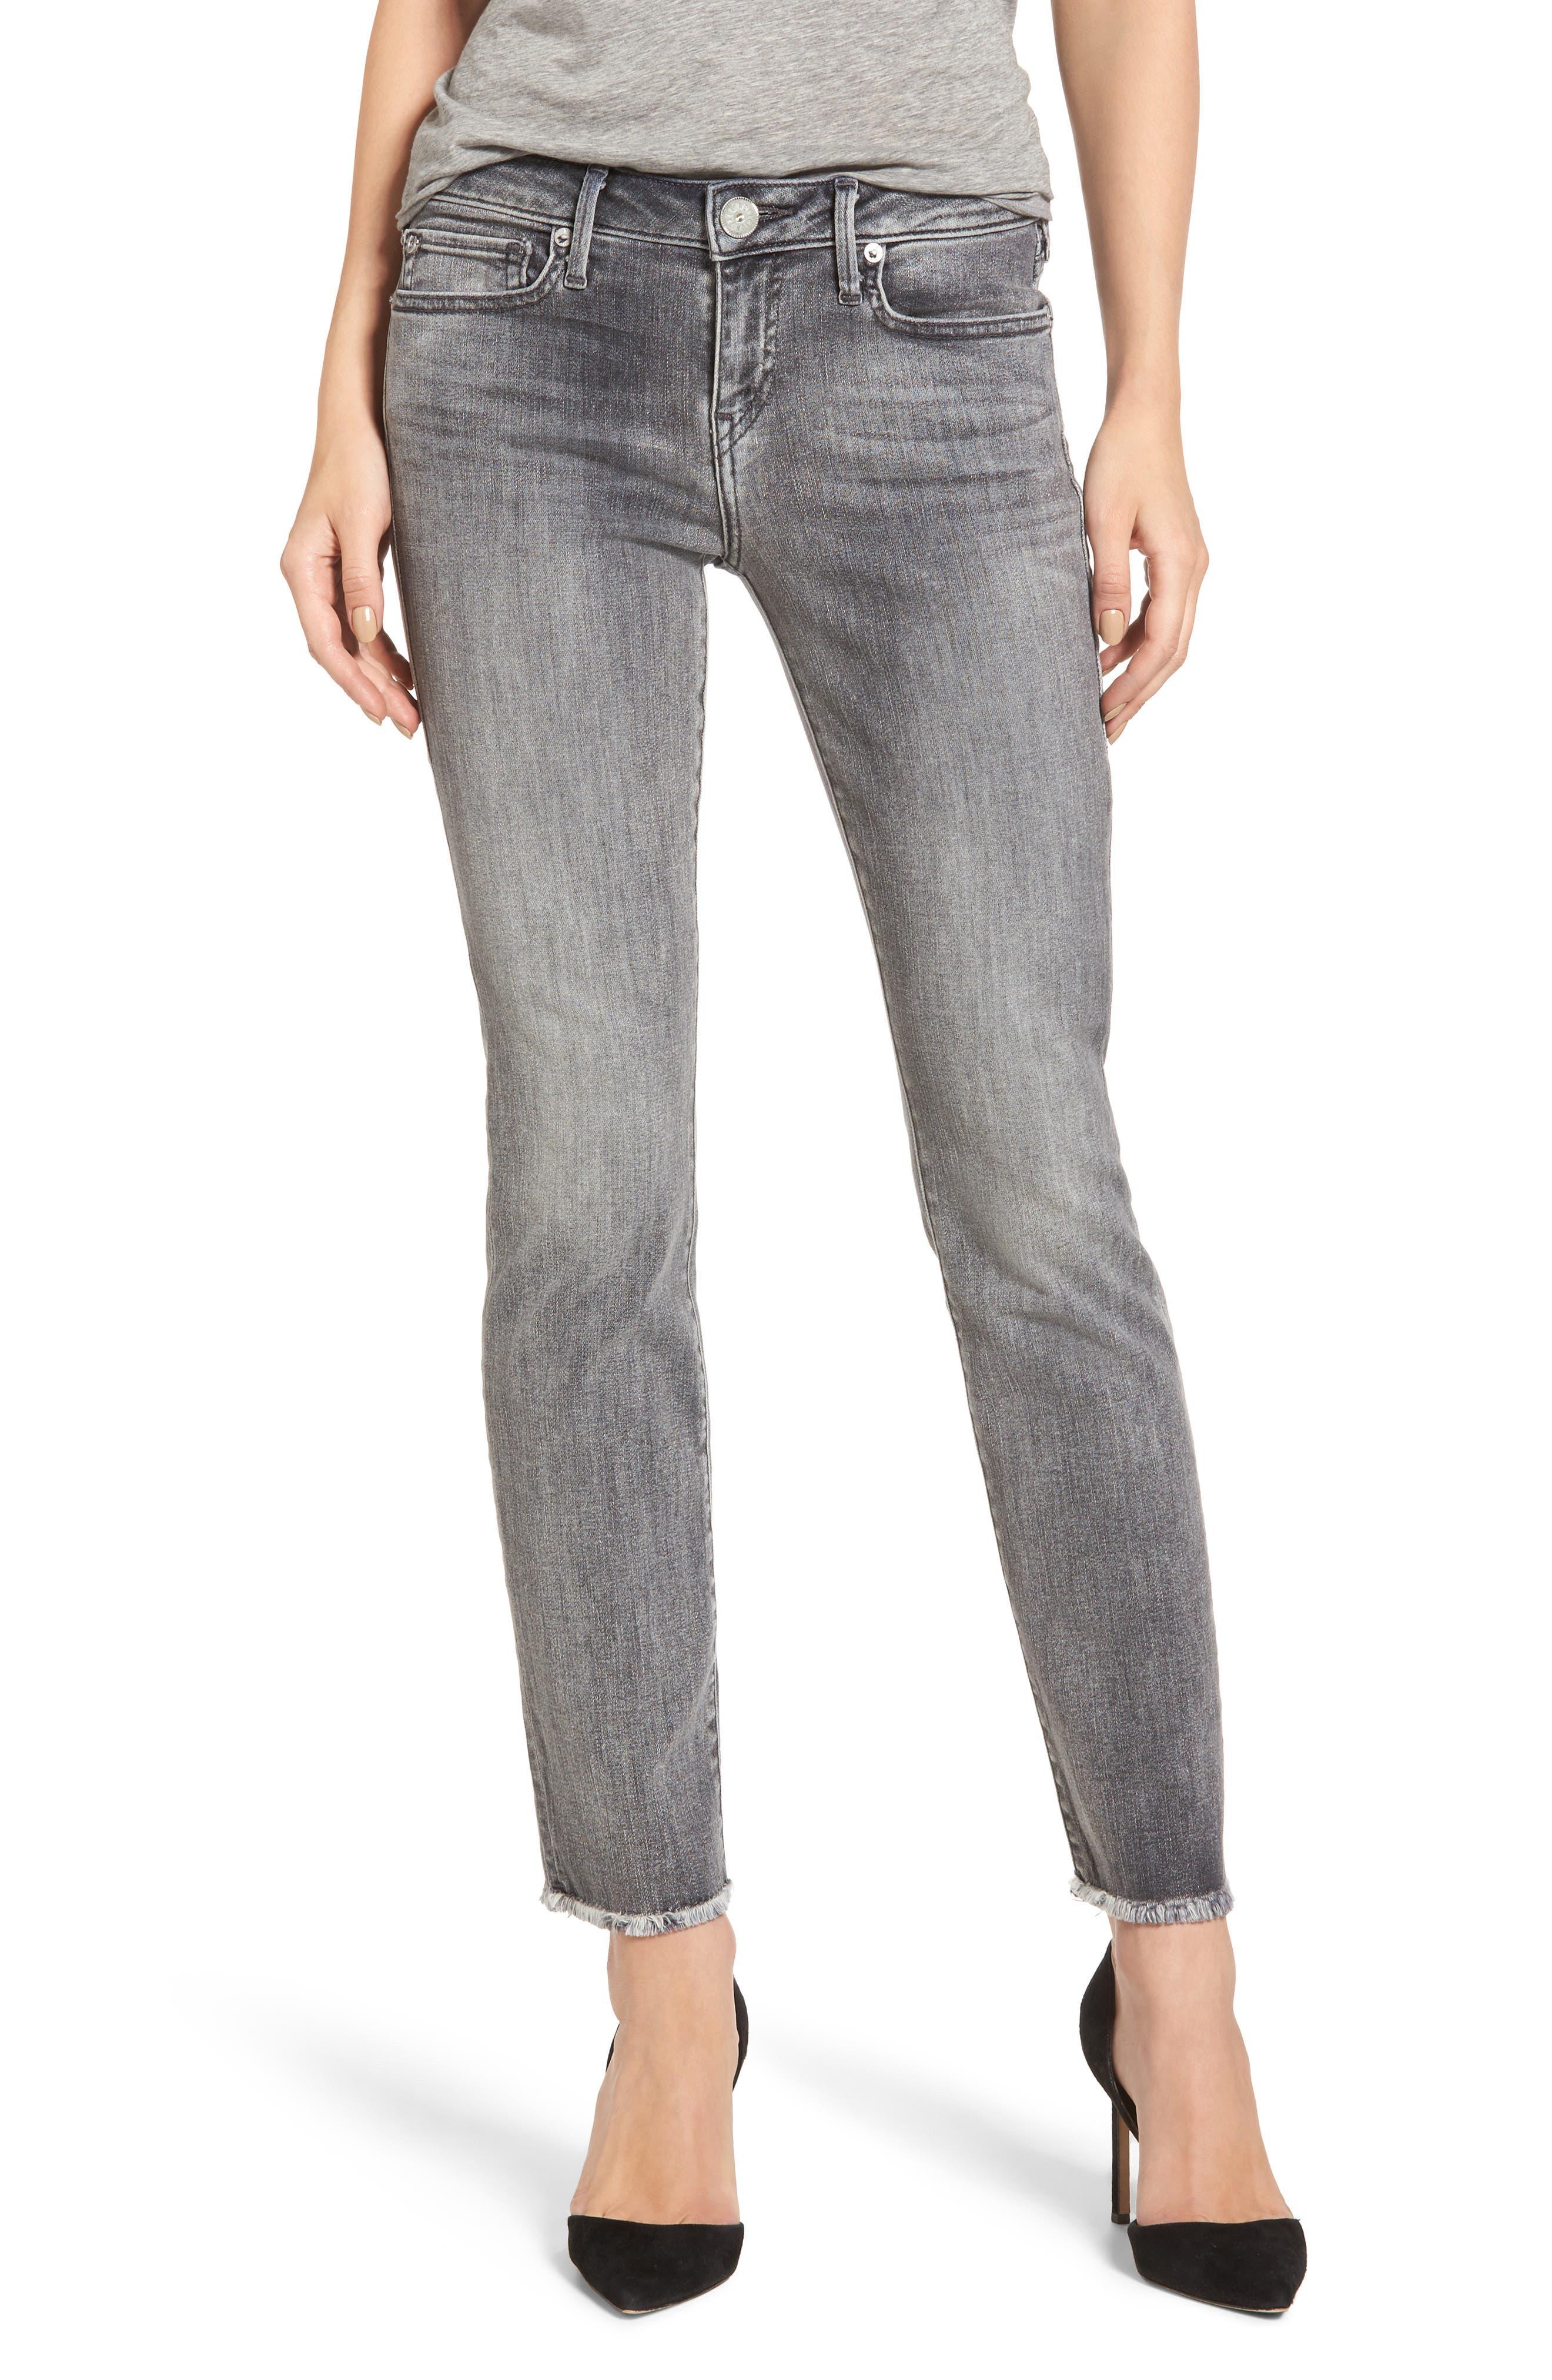 Alternate Image 1 Selected - True Religion Brand Jeans Sara Crop Cigarette Jeans (Eternal Grey)